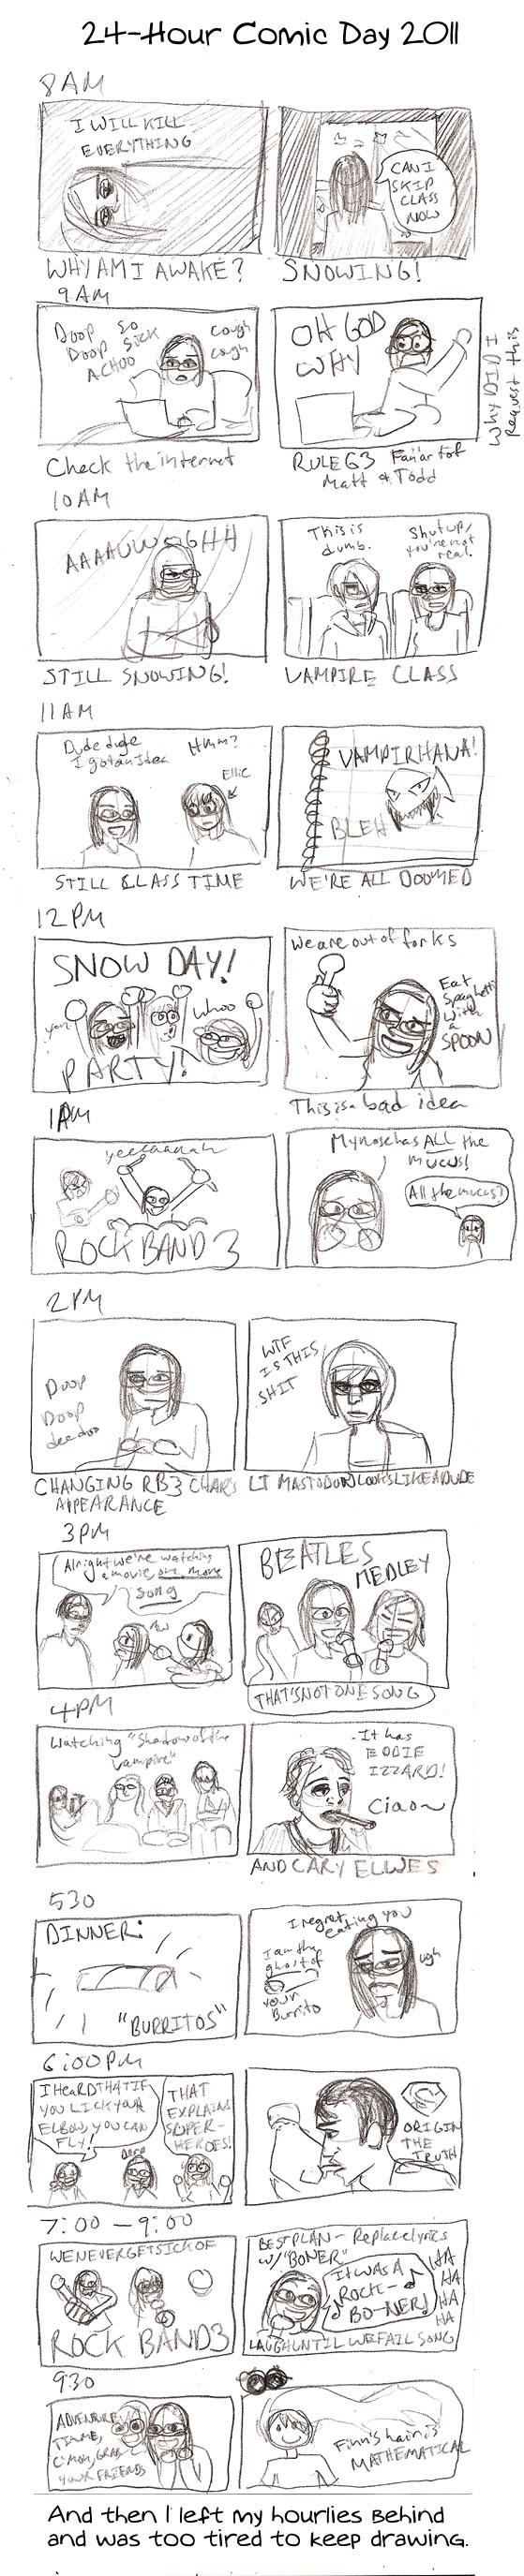 Hourly Comic Day 2011